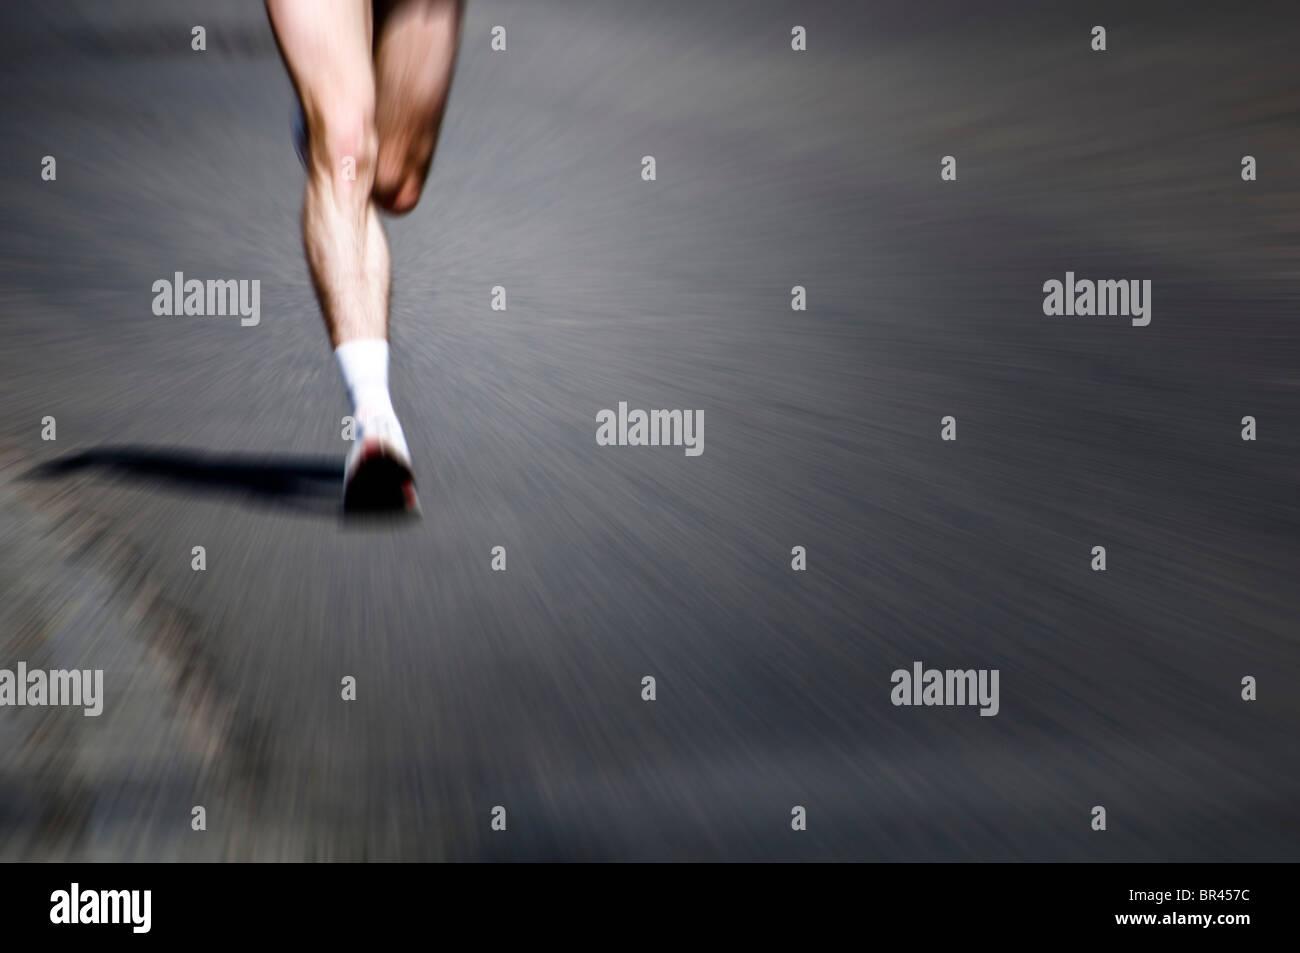 marathon runner legs - Stock Image